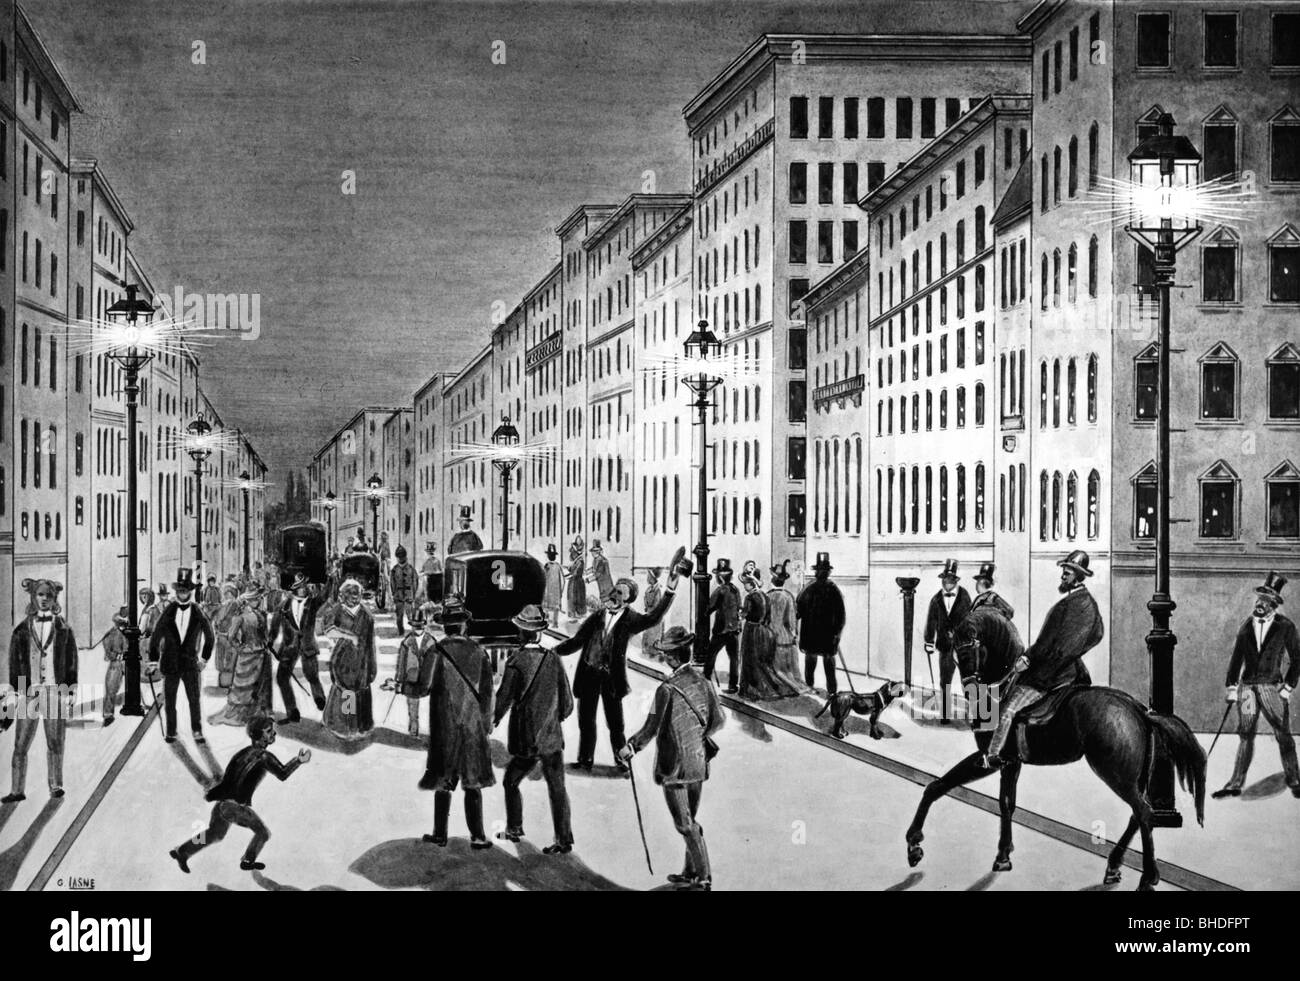 Energy, Electricity, Street Light, First Electric Lighting, New York, USA,  Circa 1882, 19th Century, Historic, Historical, Publi